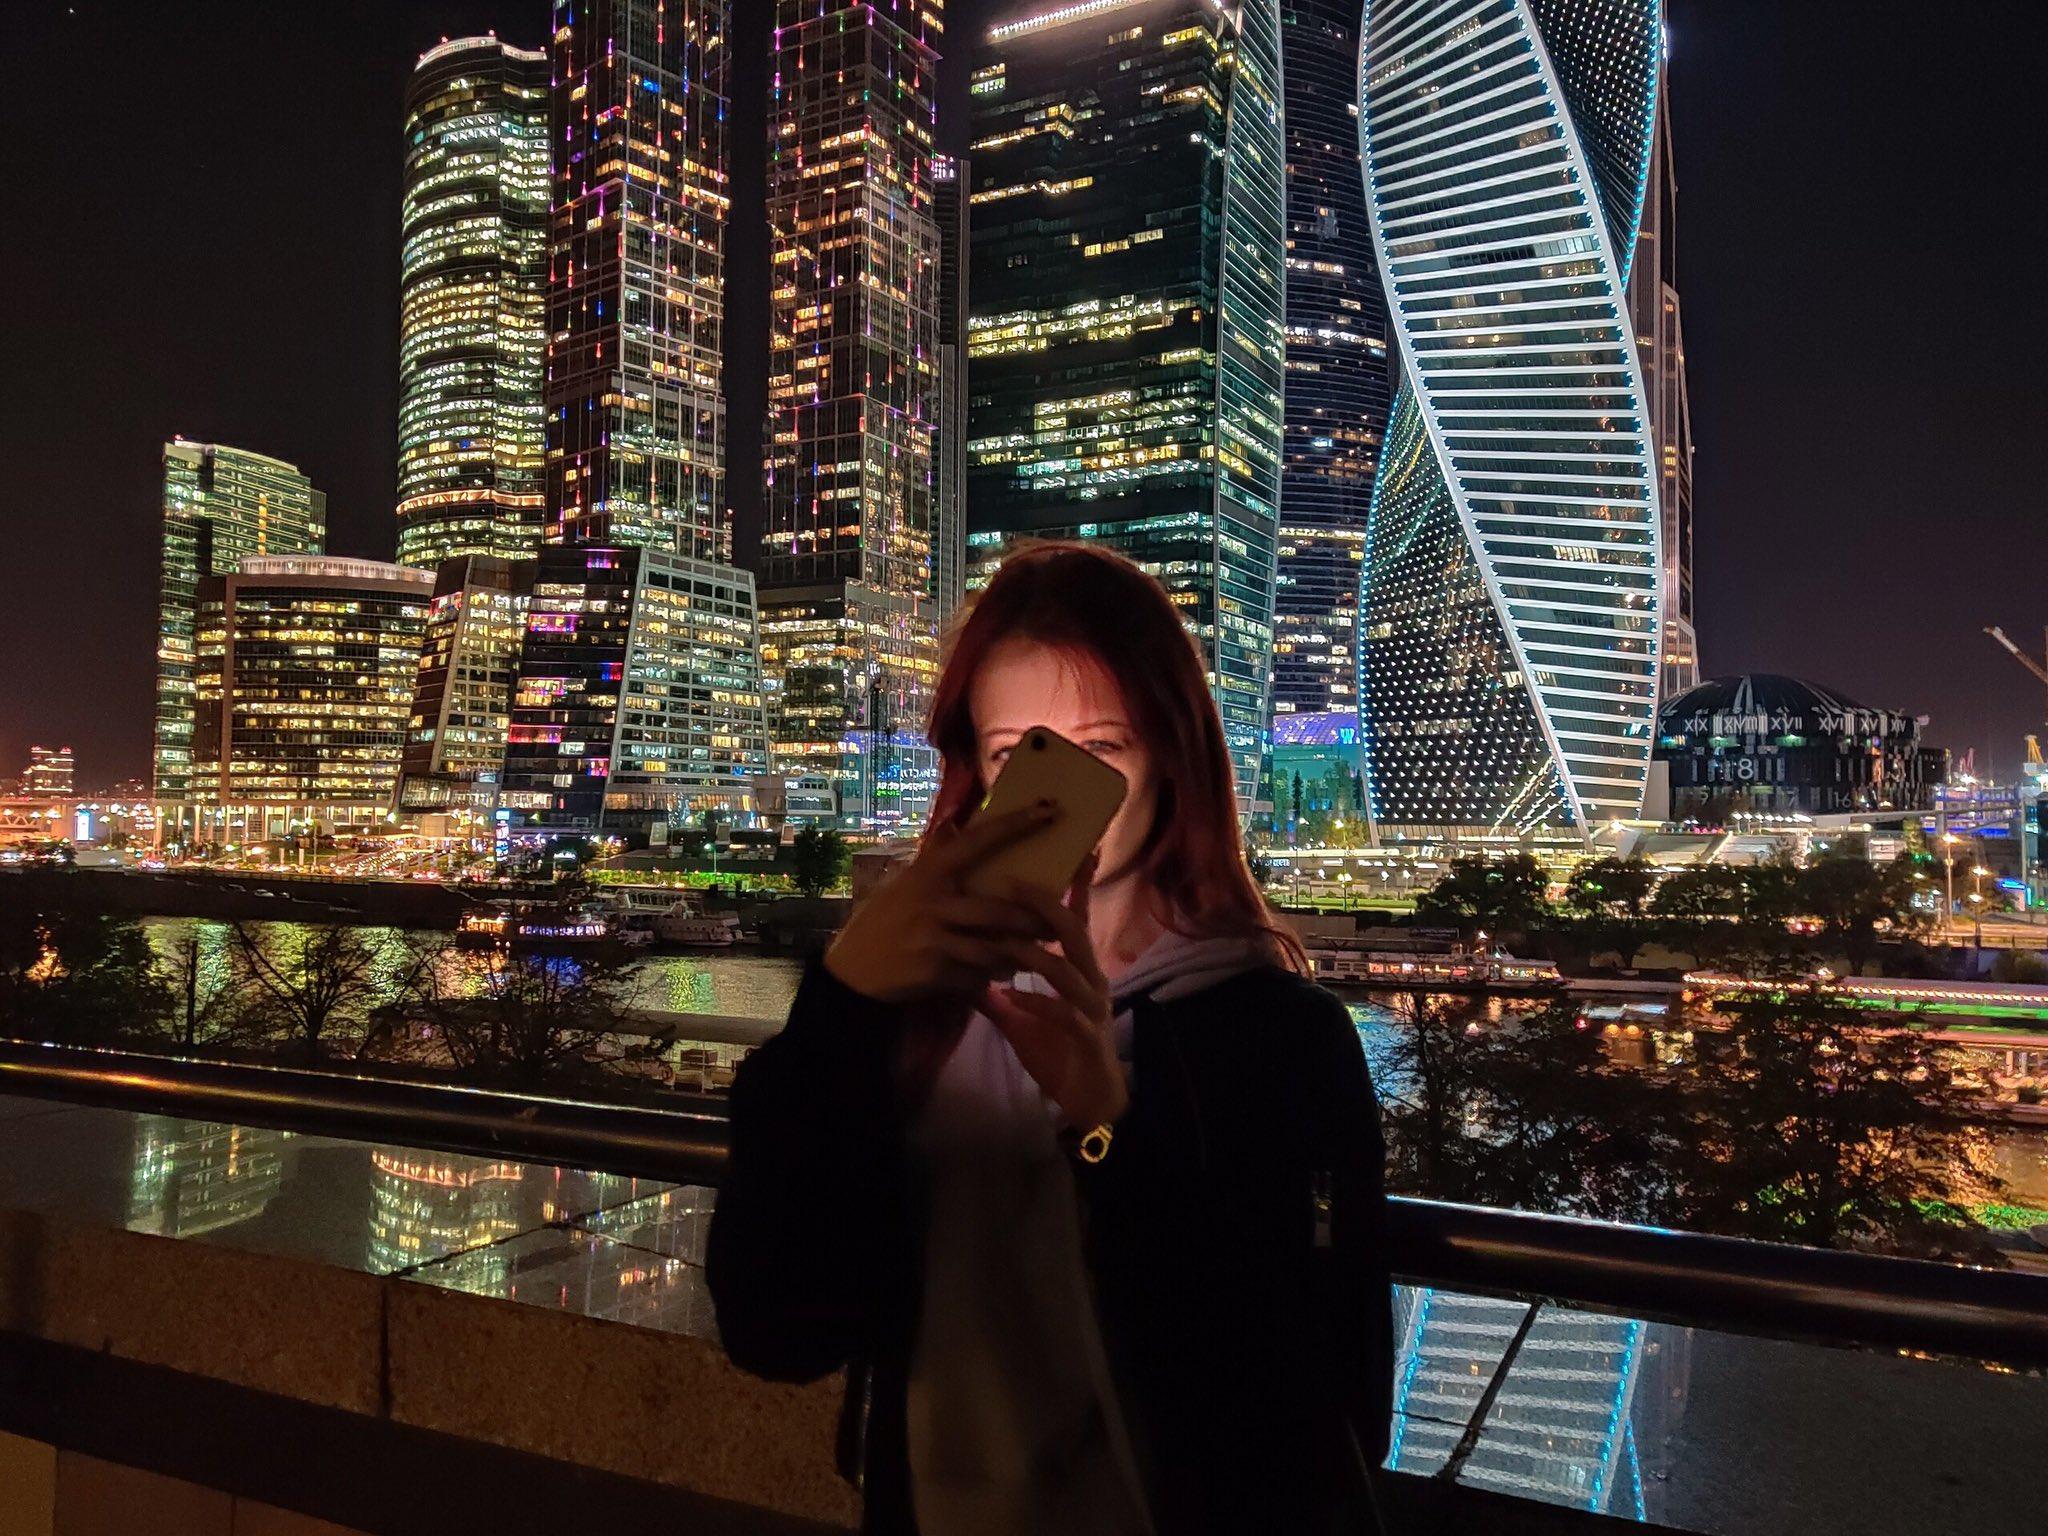 фото с москва сити ночью людей